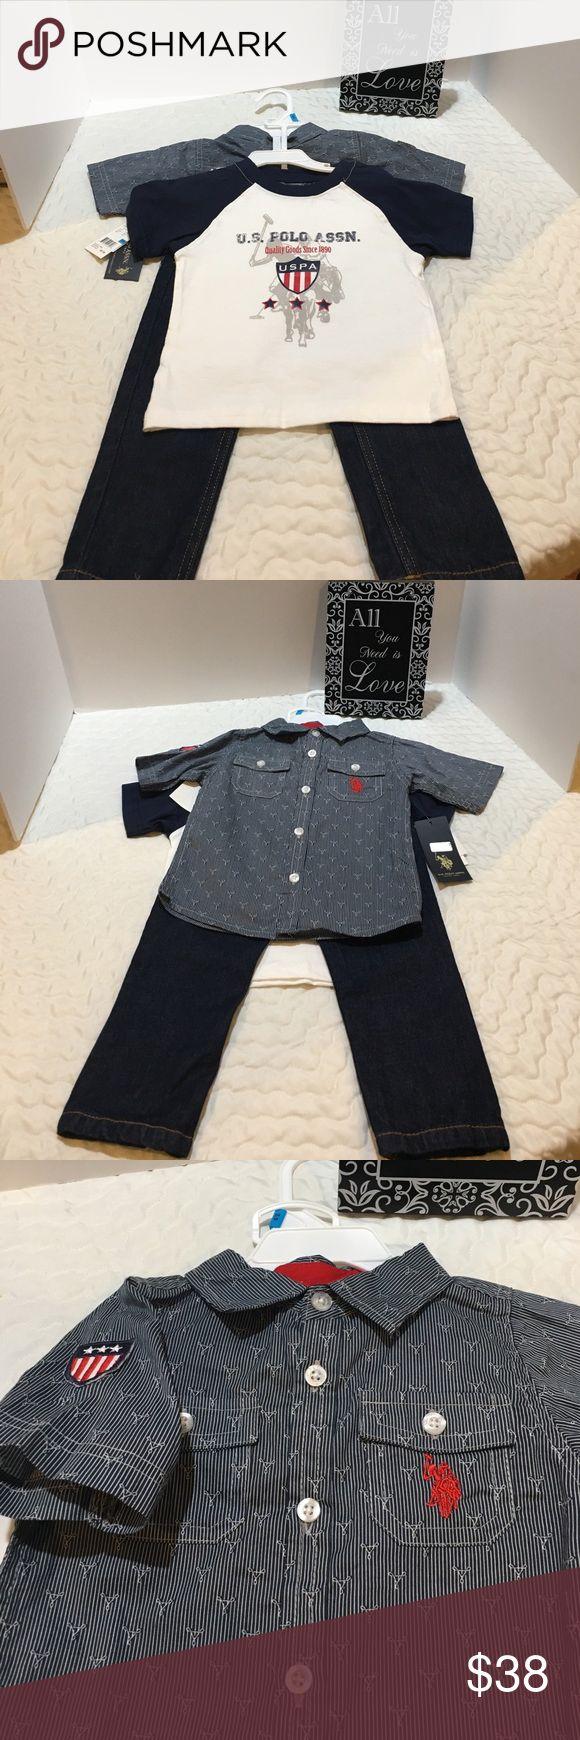 Polo 3 Piece Matching Set Polo 3 Peace matching set. T-shirt,  button up shirt and jeans.  NWT U.S. Polo Assn. Matching Sets